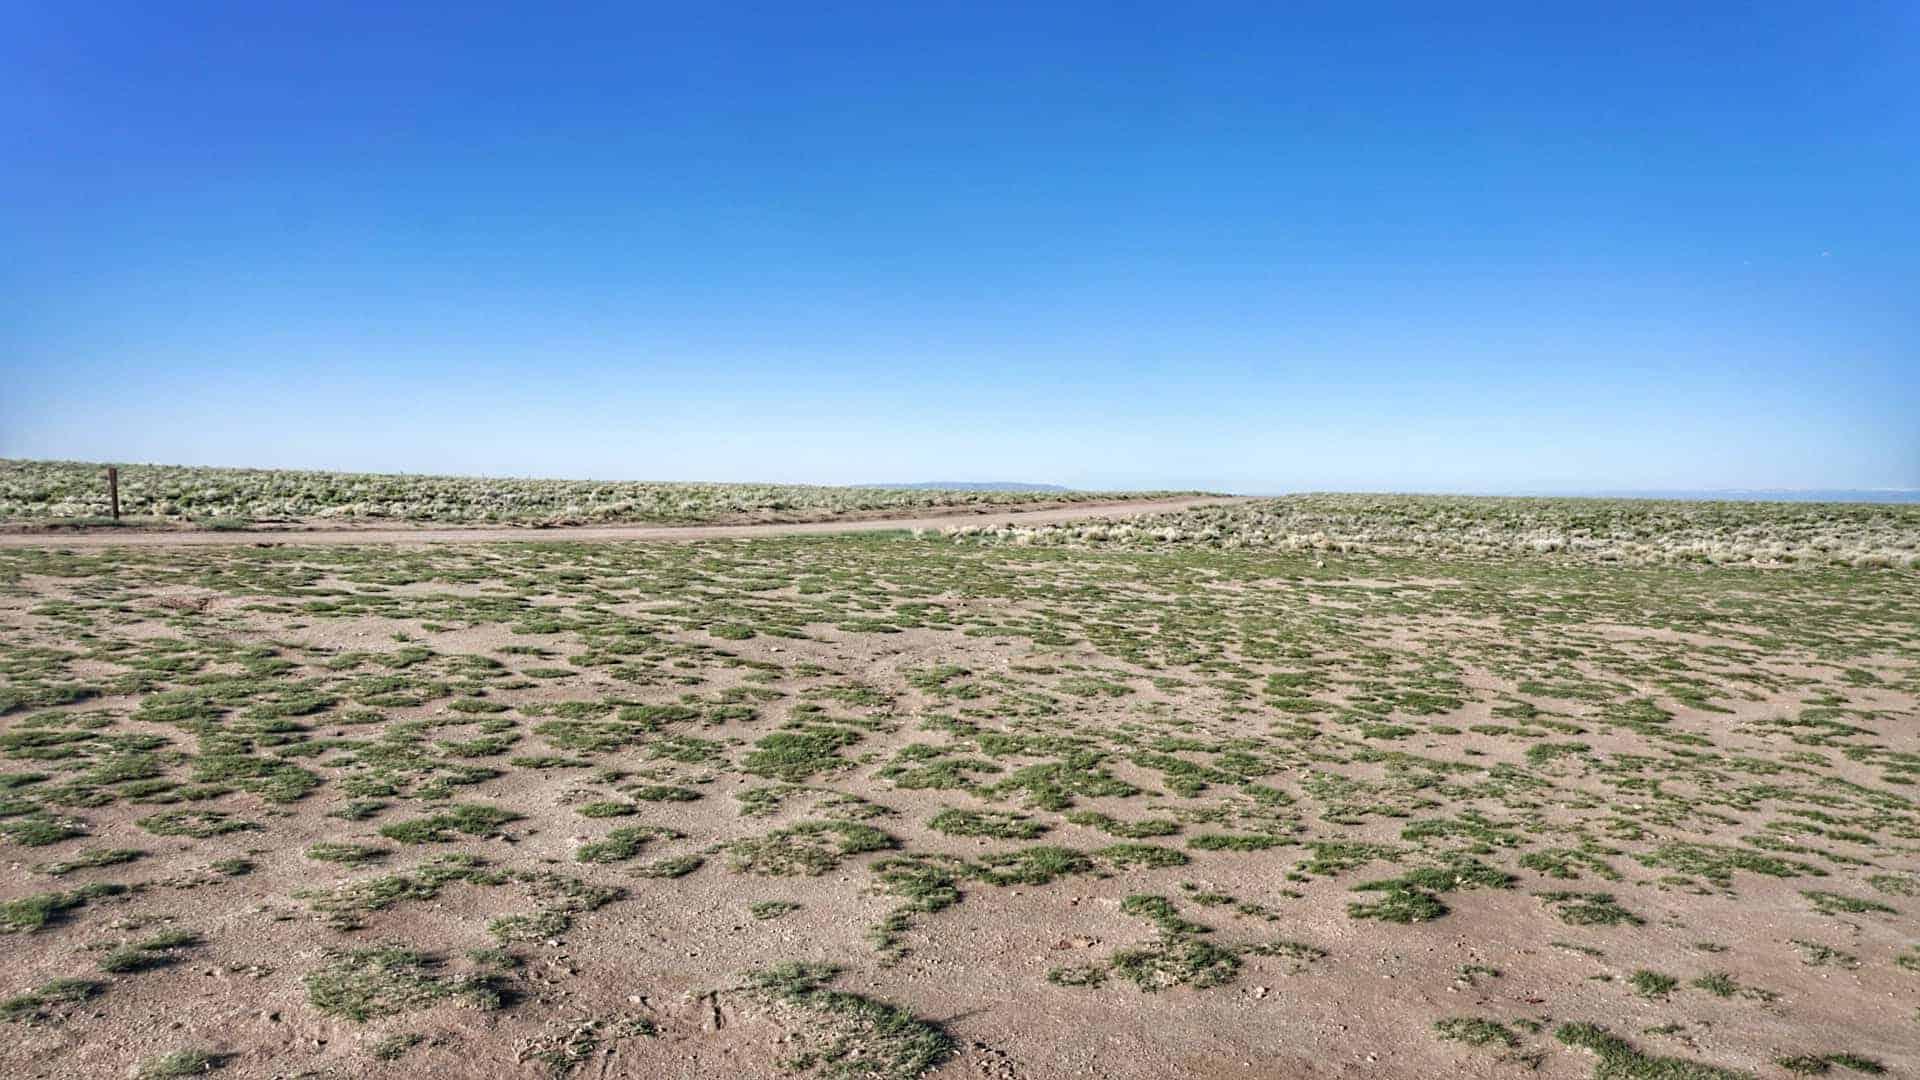 Boondocking Great Sand Dunes National Park 7